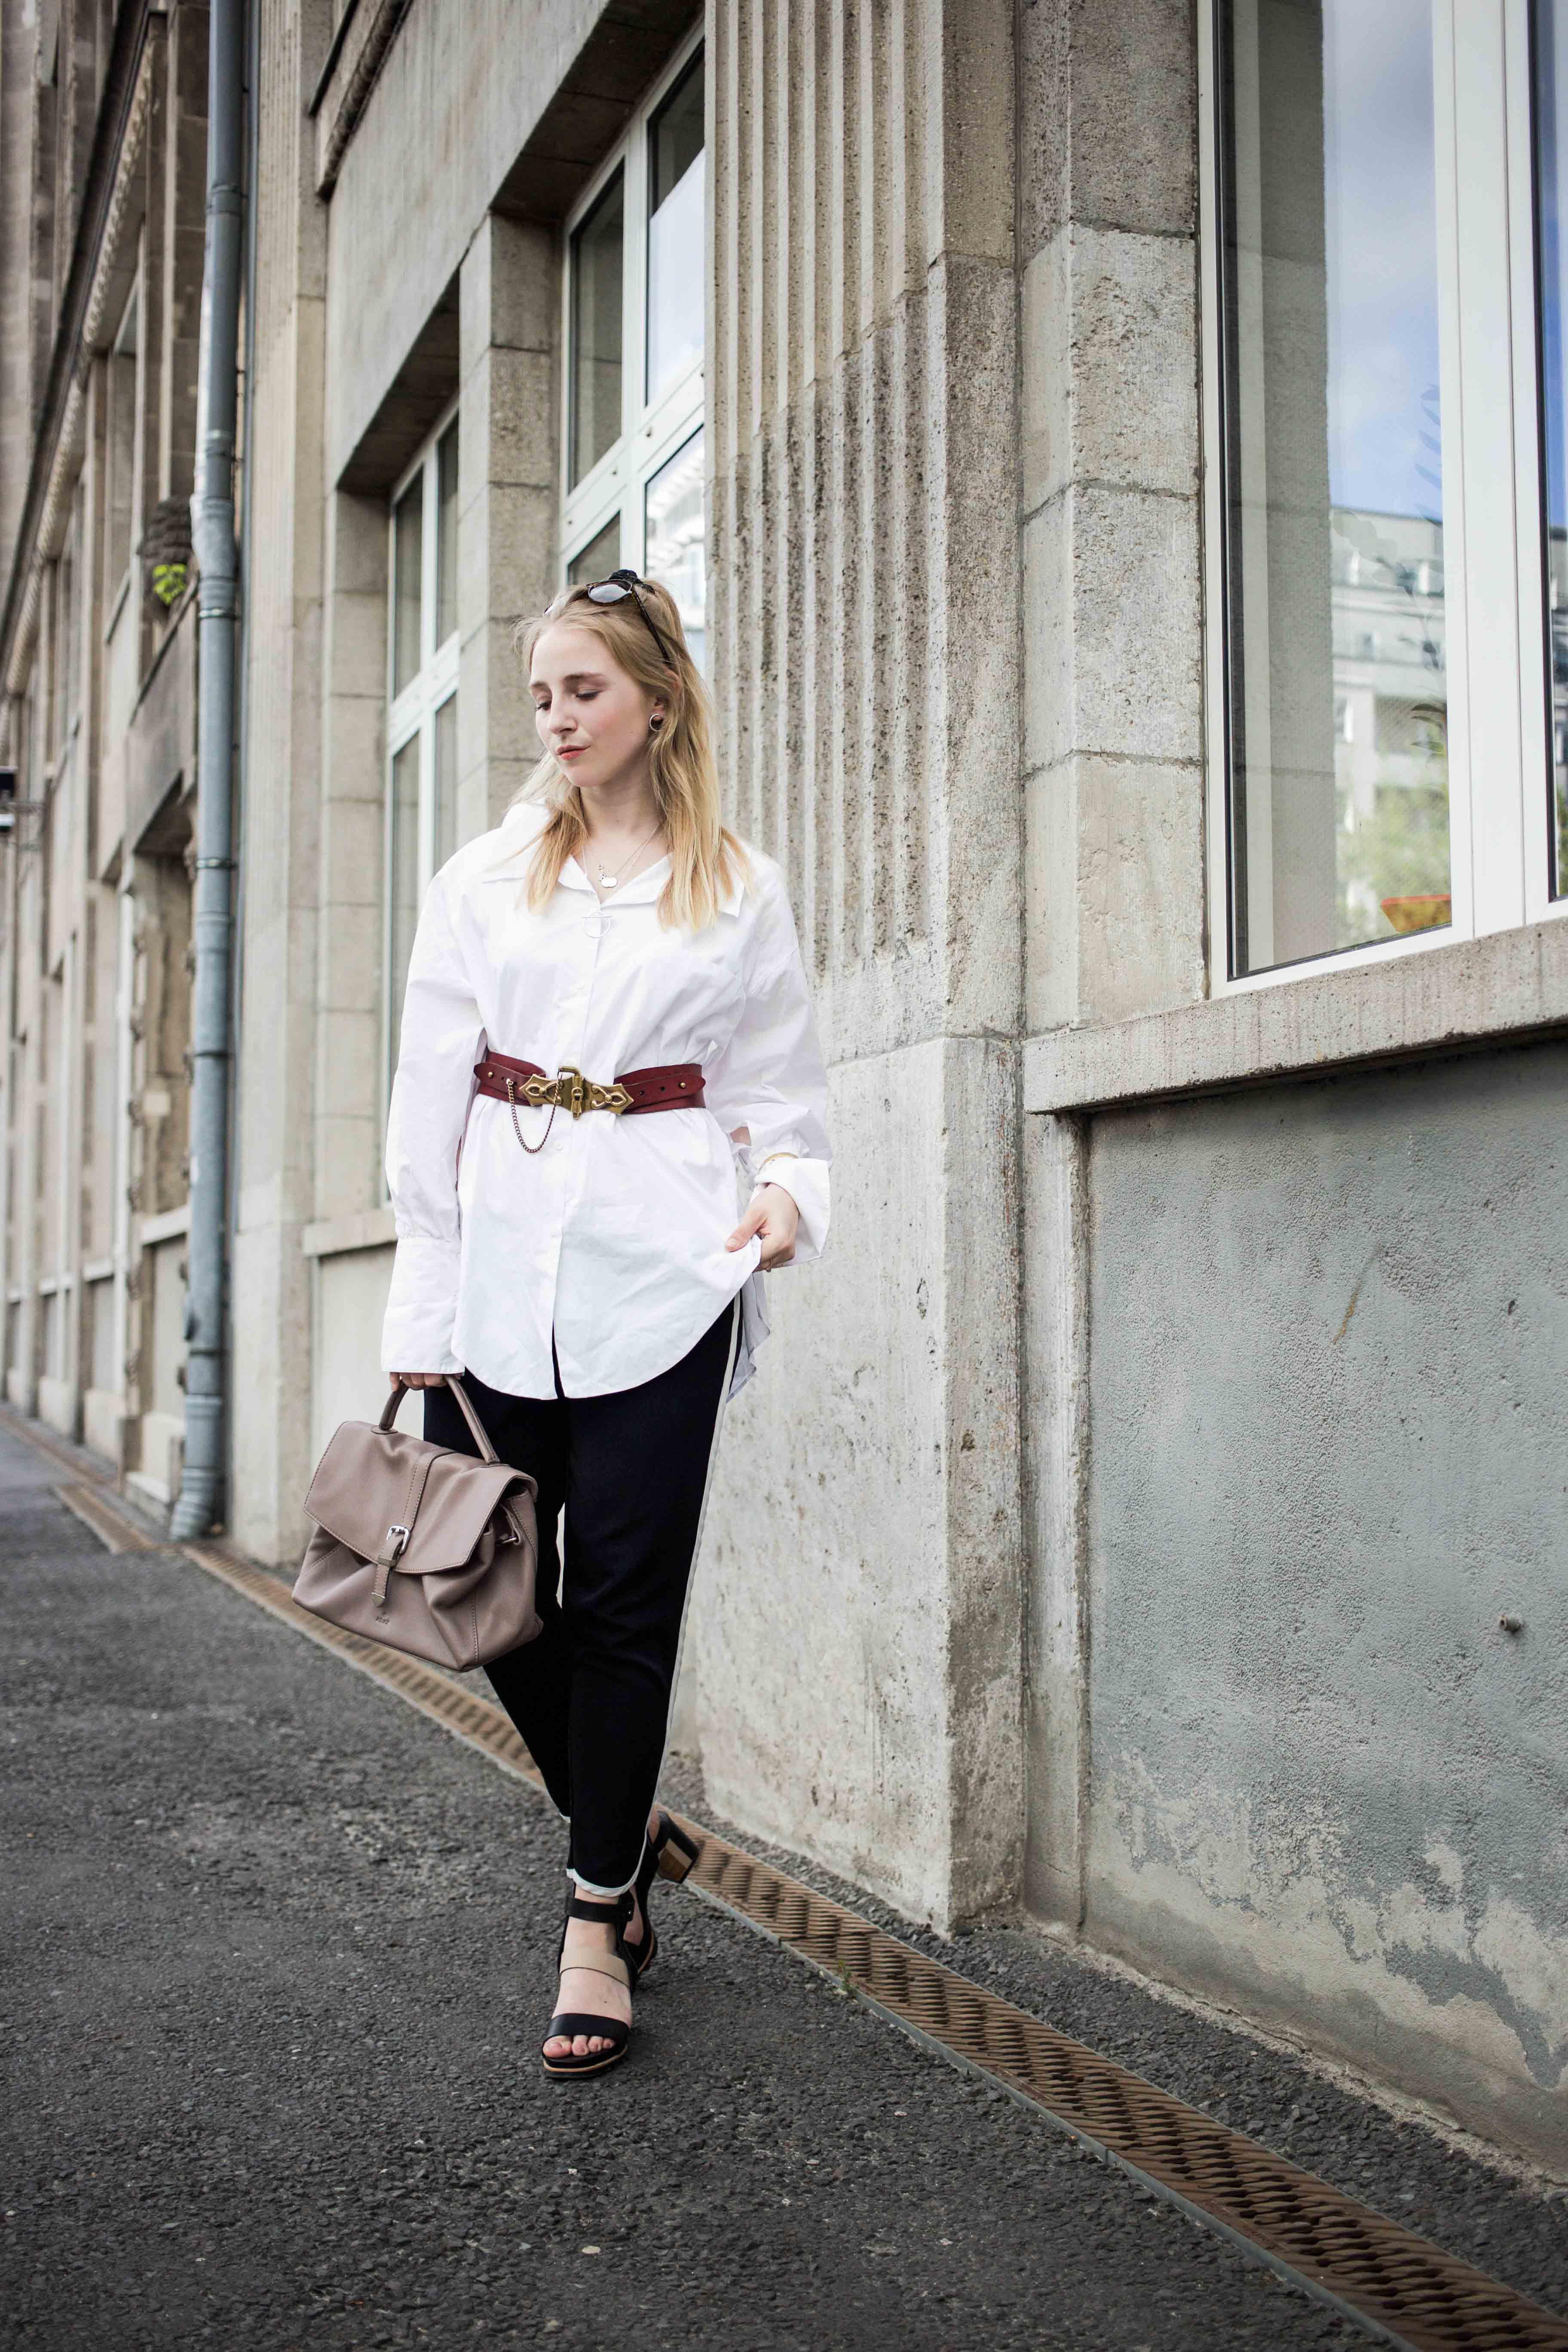 fashionweek-berlin-statement-gürtel-oversized-bluse-outfit-modeblog_6296